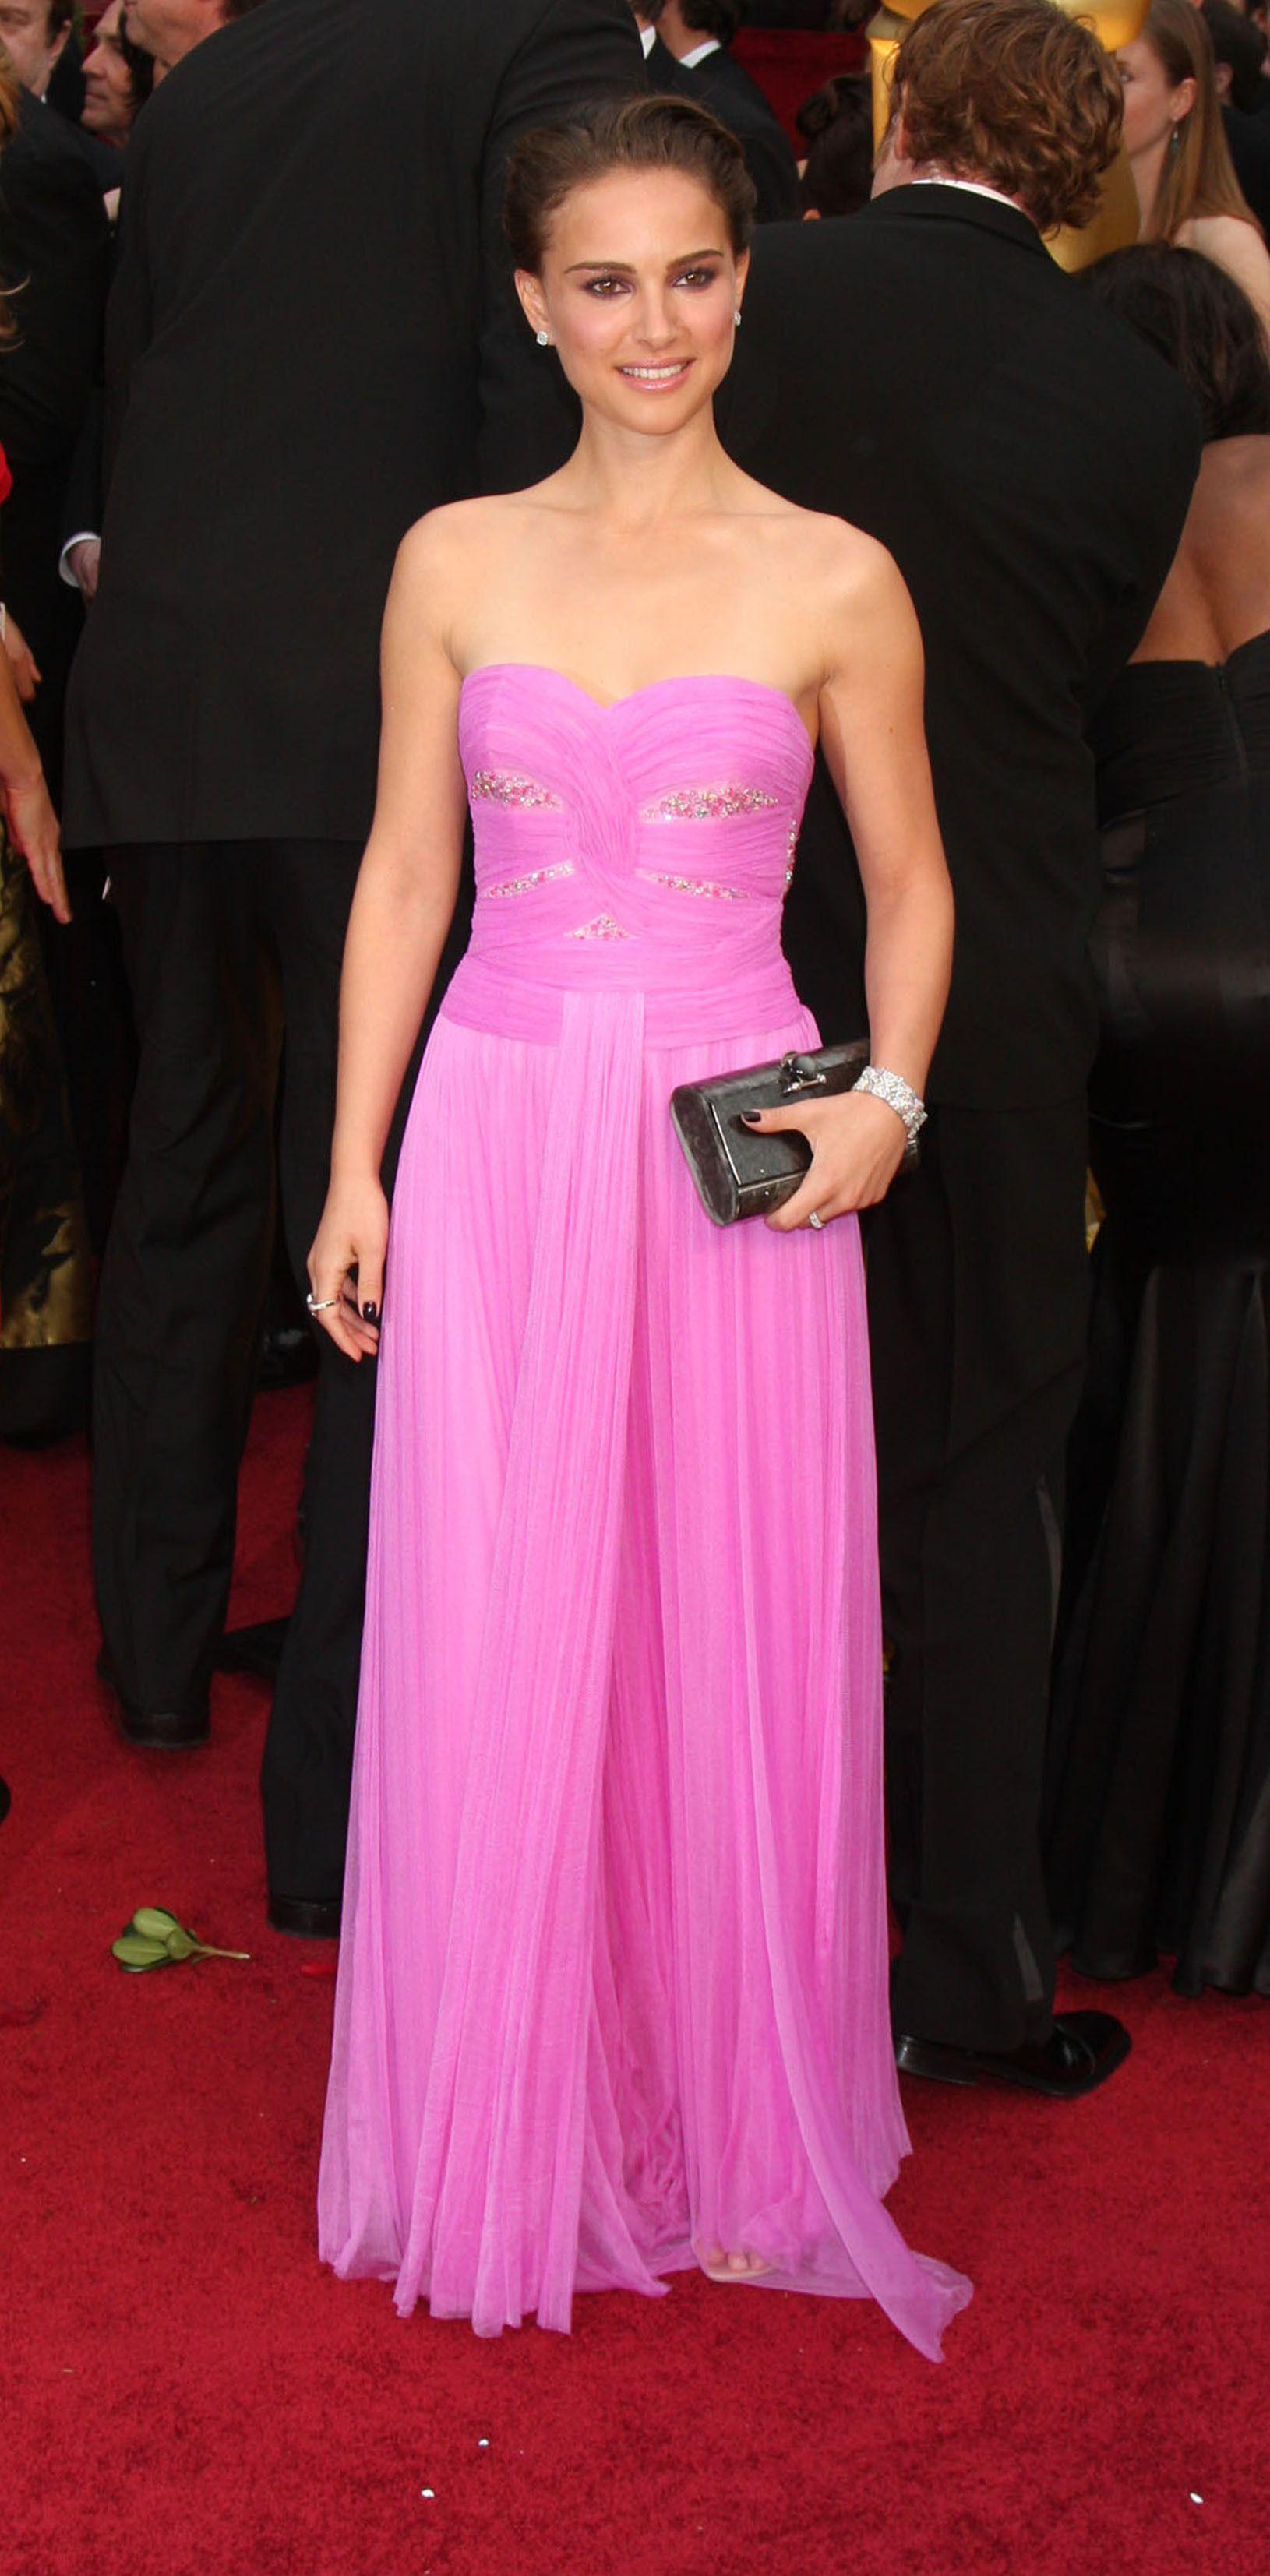 20 Classic Oscar looks: Natalie Portman | Vestidos alta costura ...